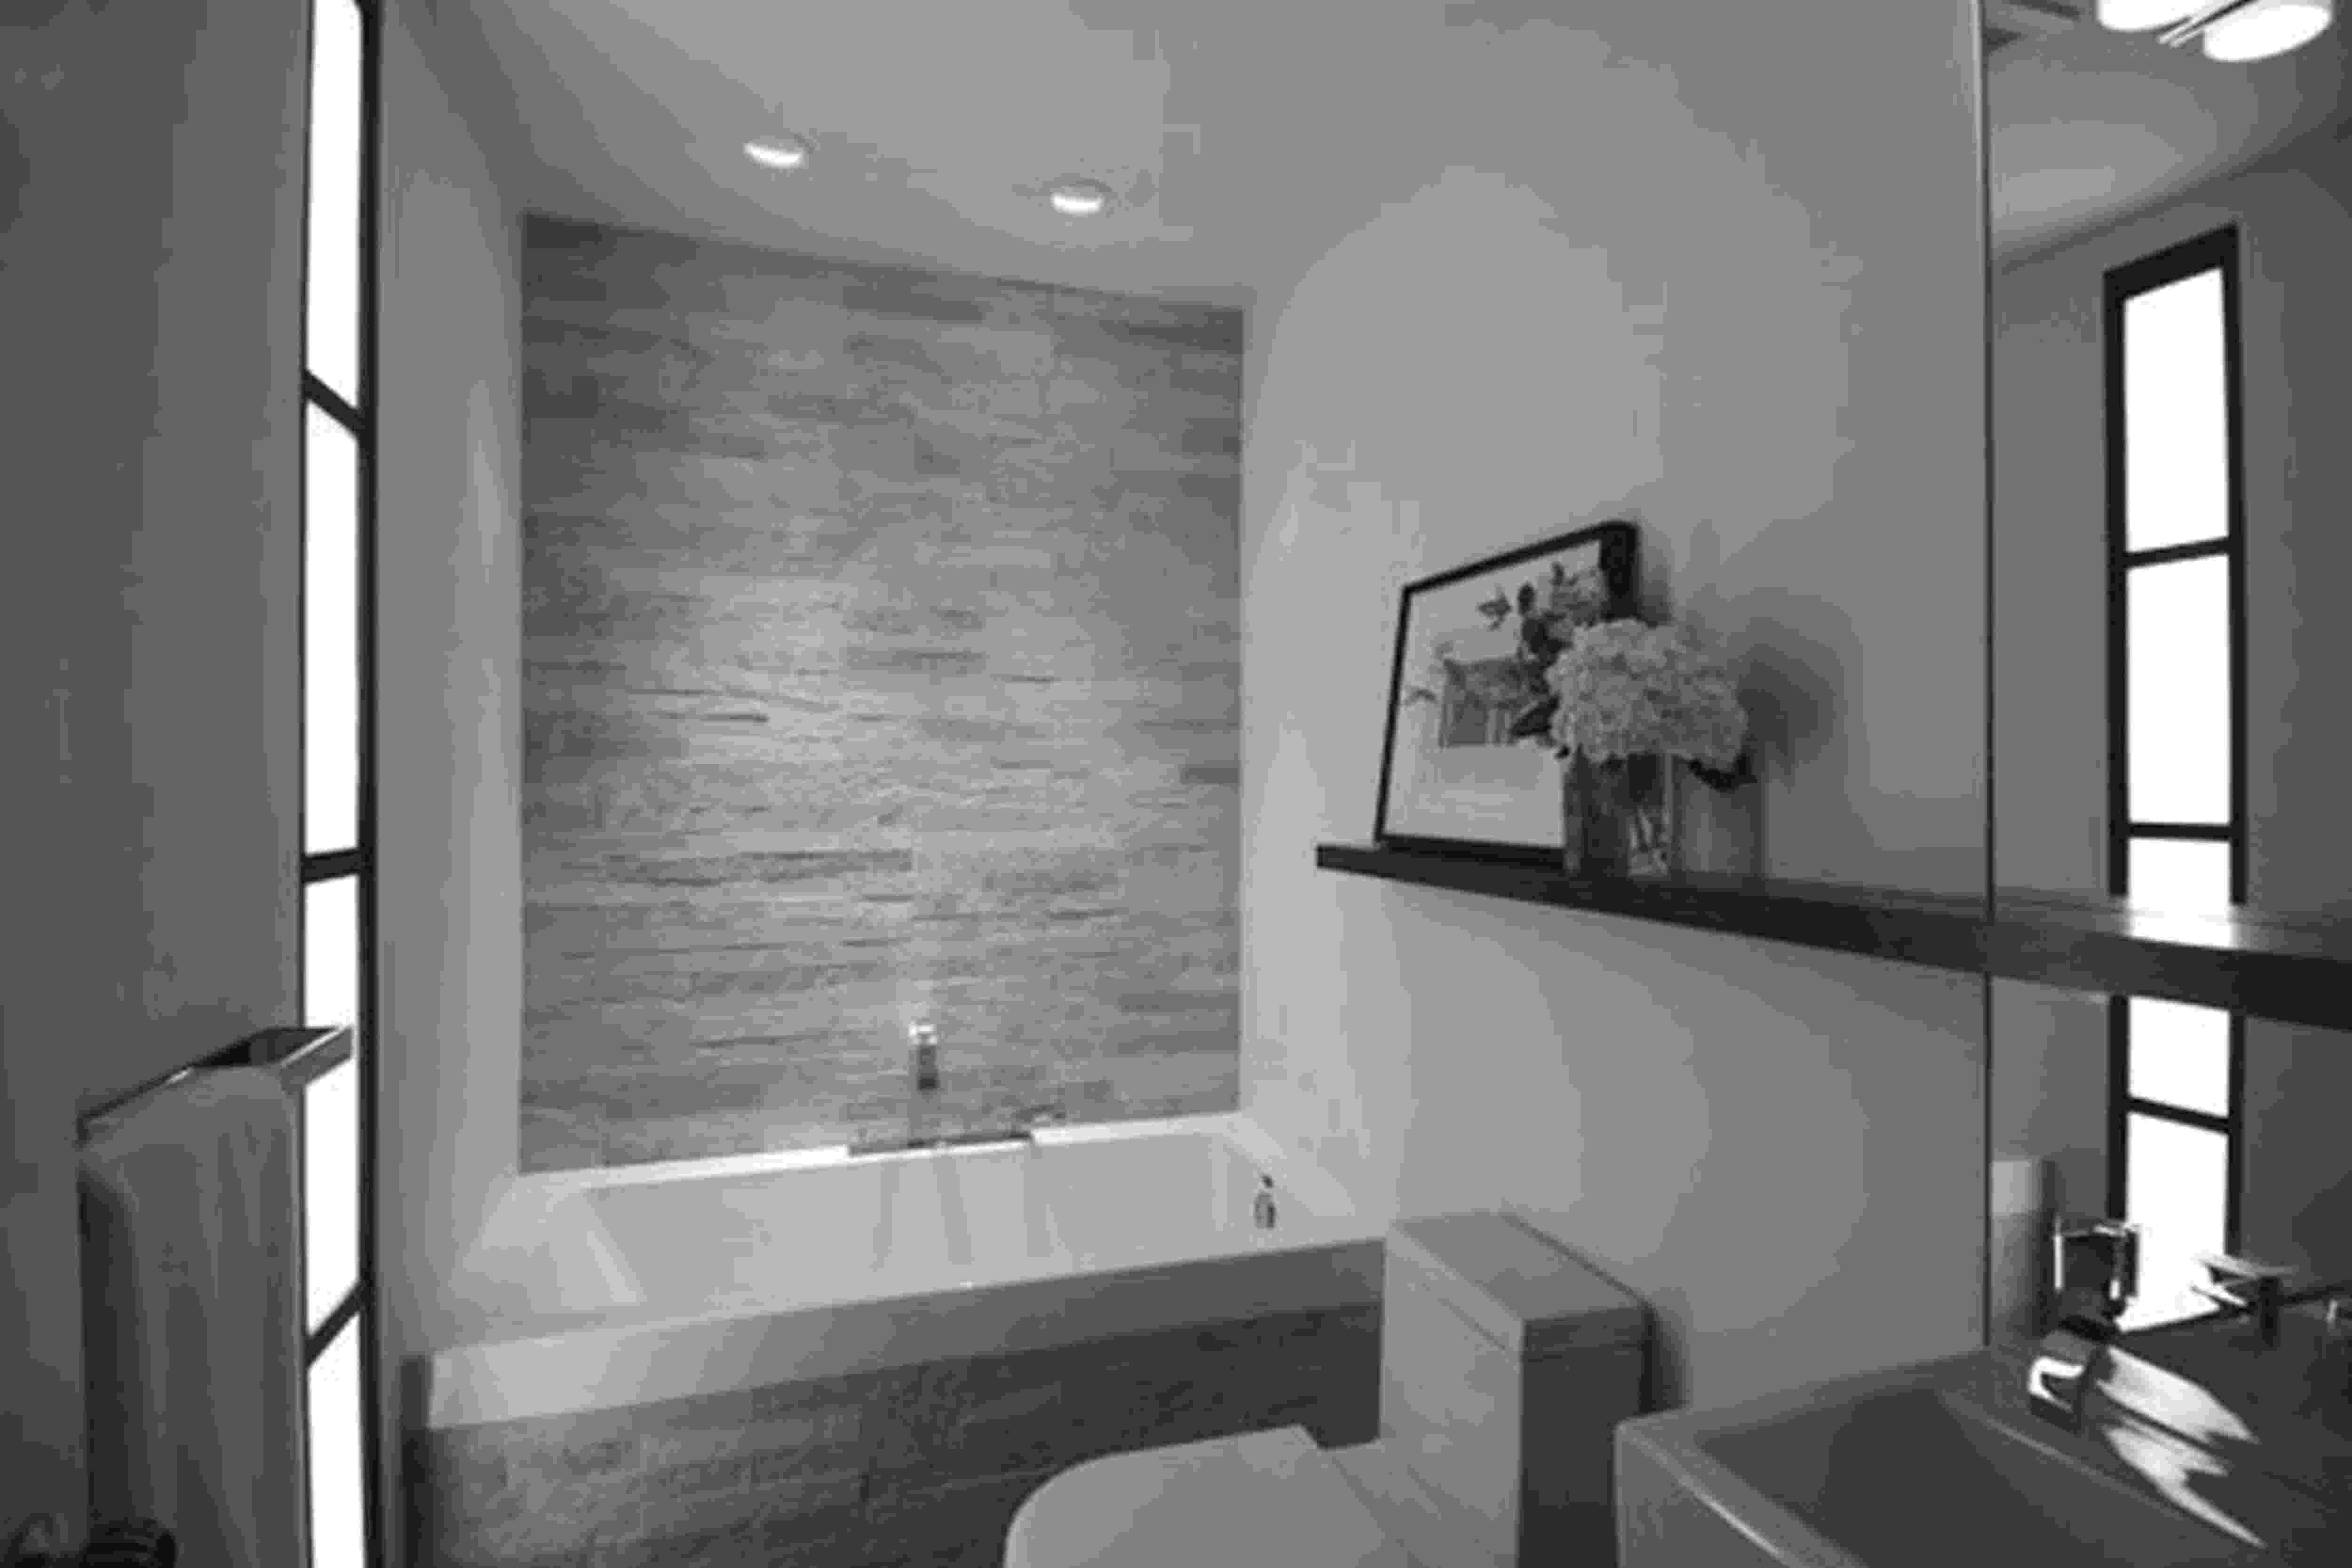 bathroom colours ideas designs 25 grey wall tiles for bathroom ideas and pictures 2019 bathroom ideas colours designs